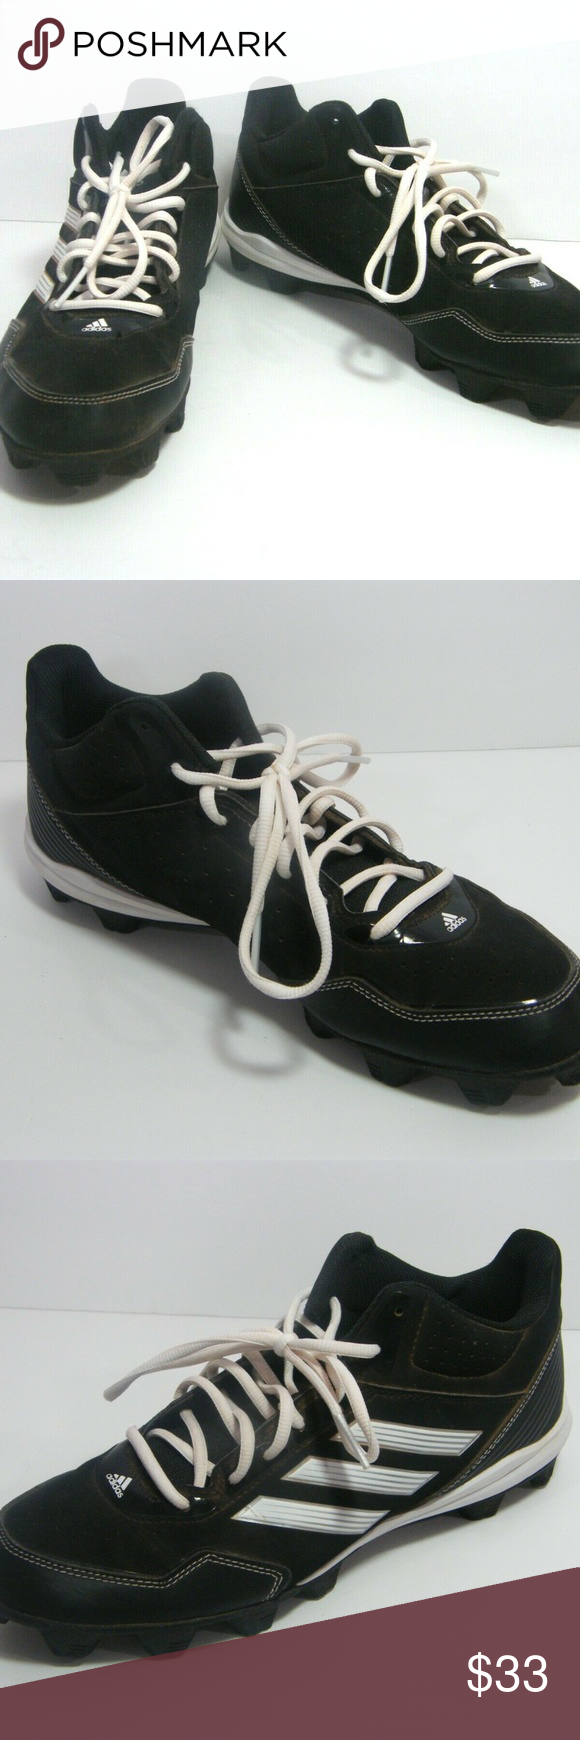 Adidas Wheelhouse Mid Baseball Cleat Shoe Mens 10 In 2020 Shoes Mens Cleats Shoes Baseball Cleats